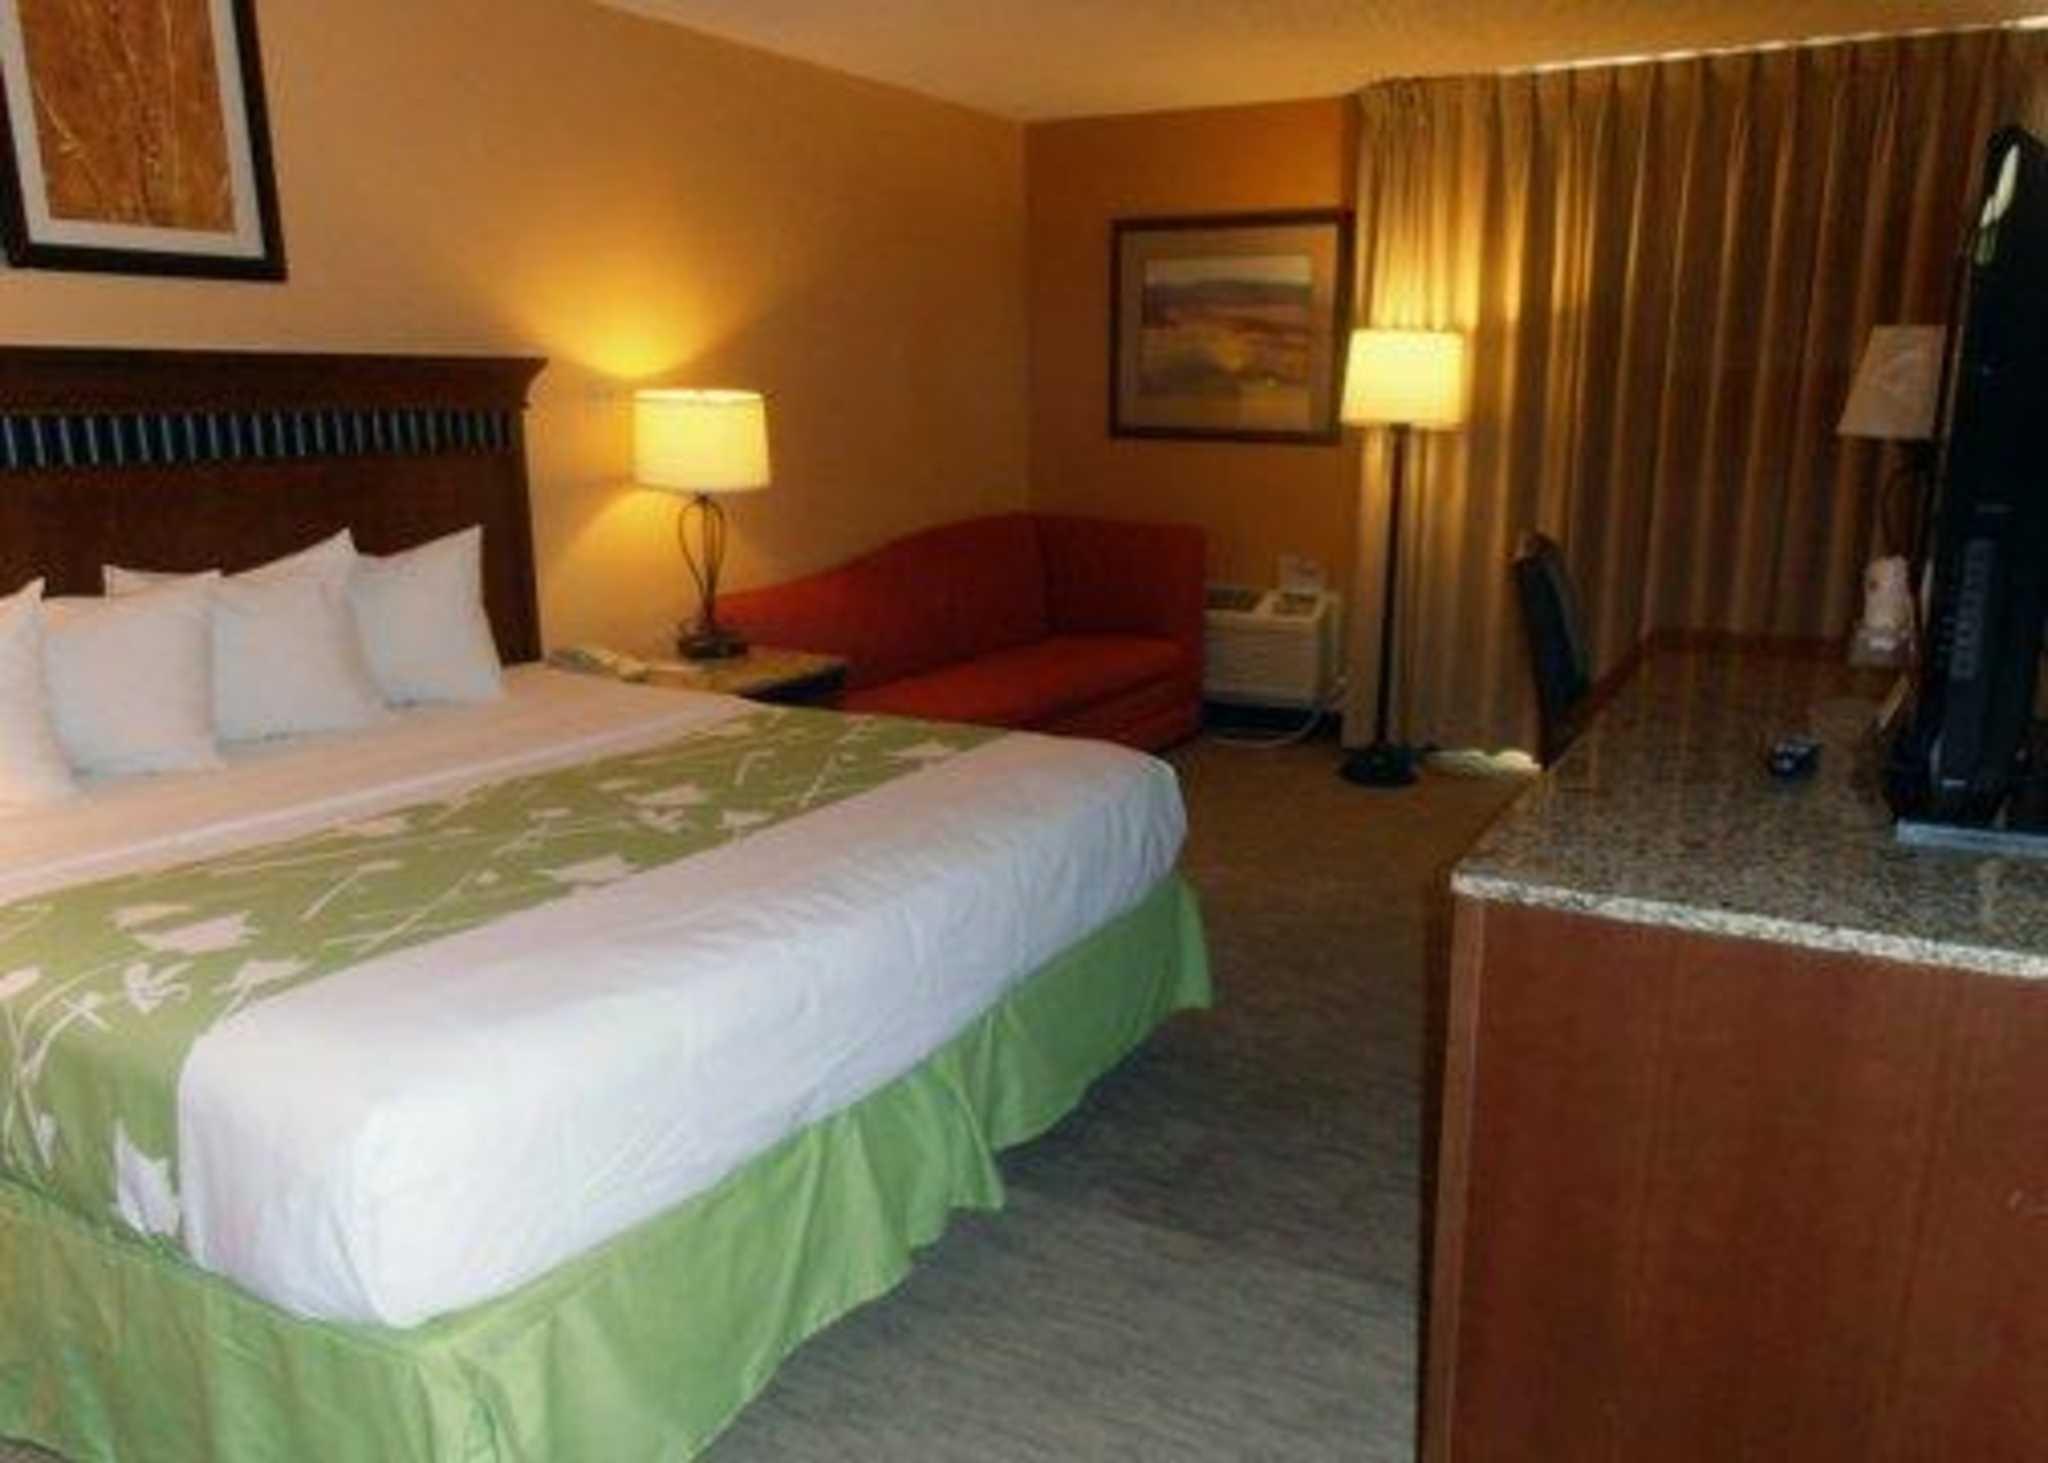 Quality Inn & Suites I-25 North image 3